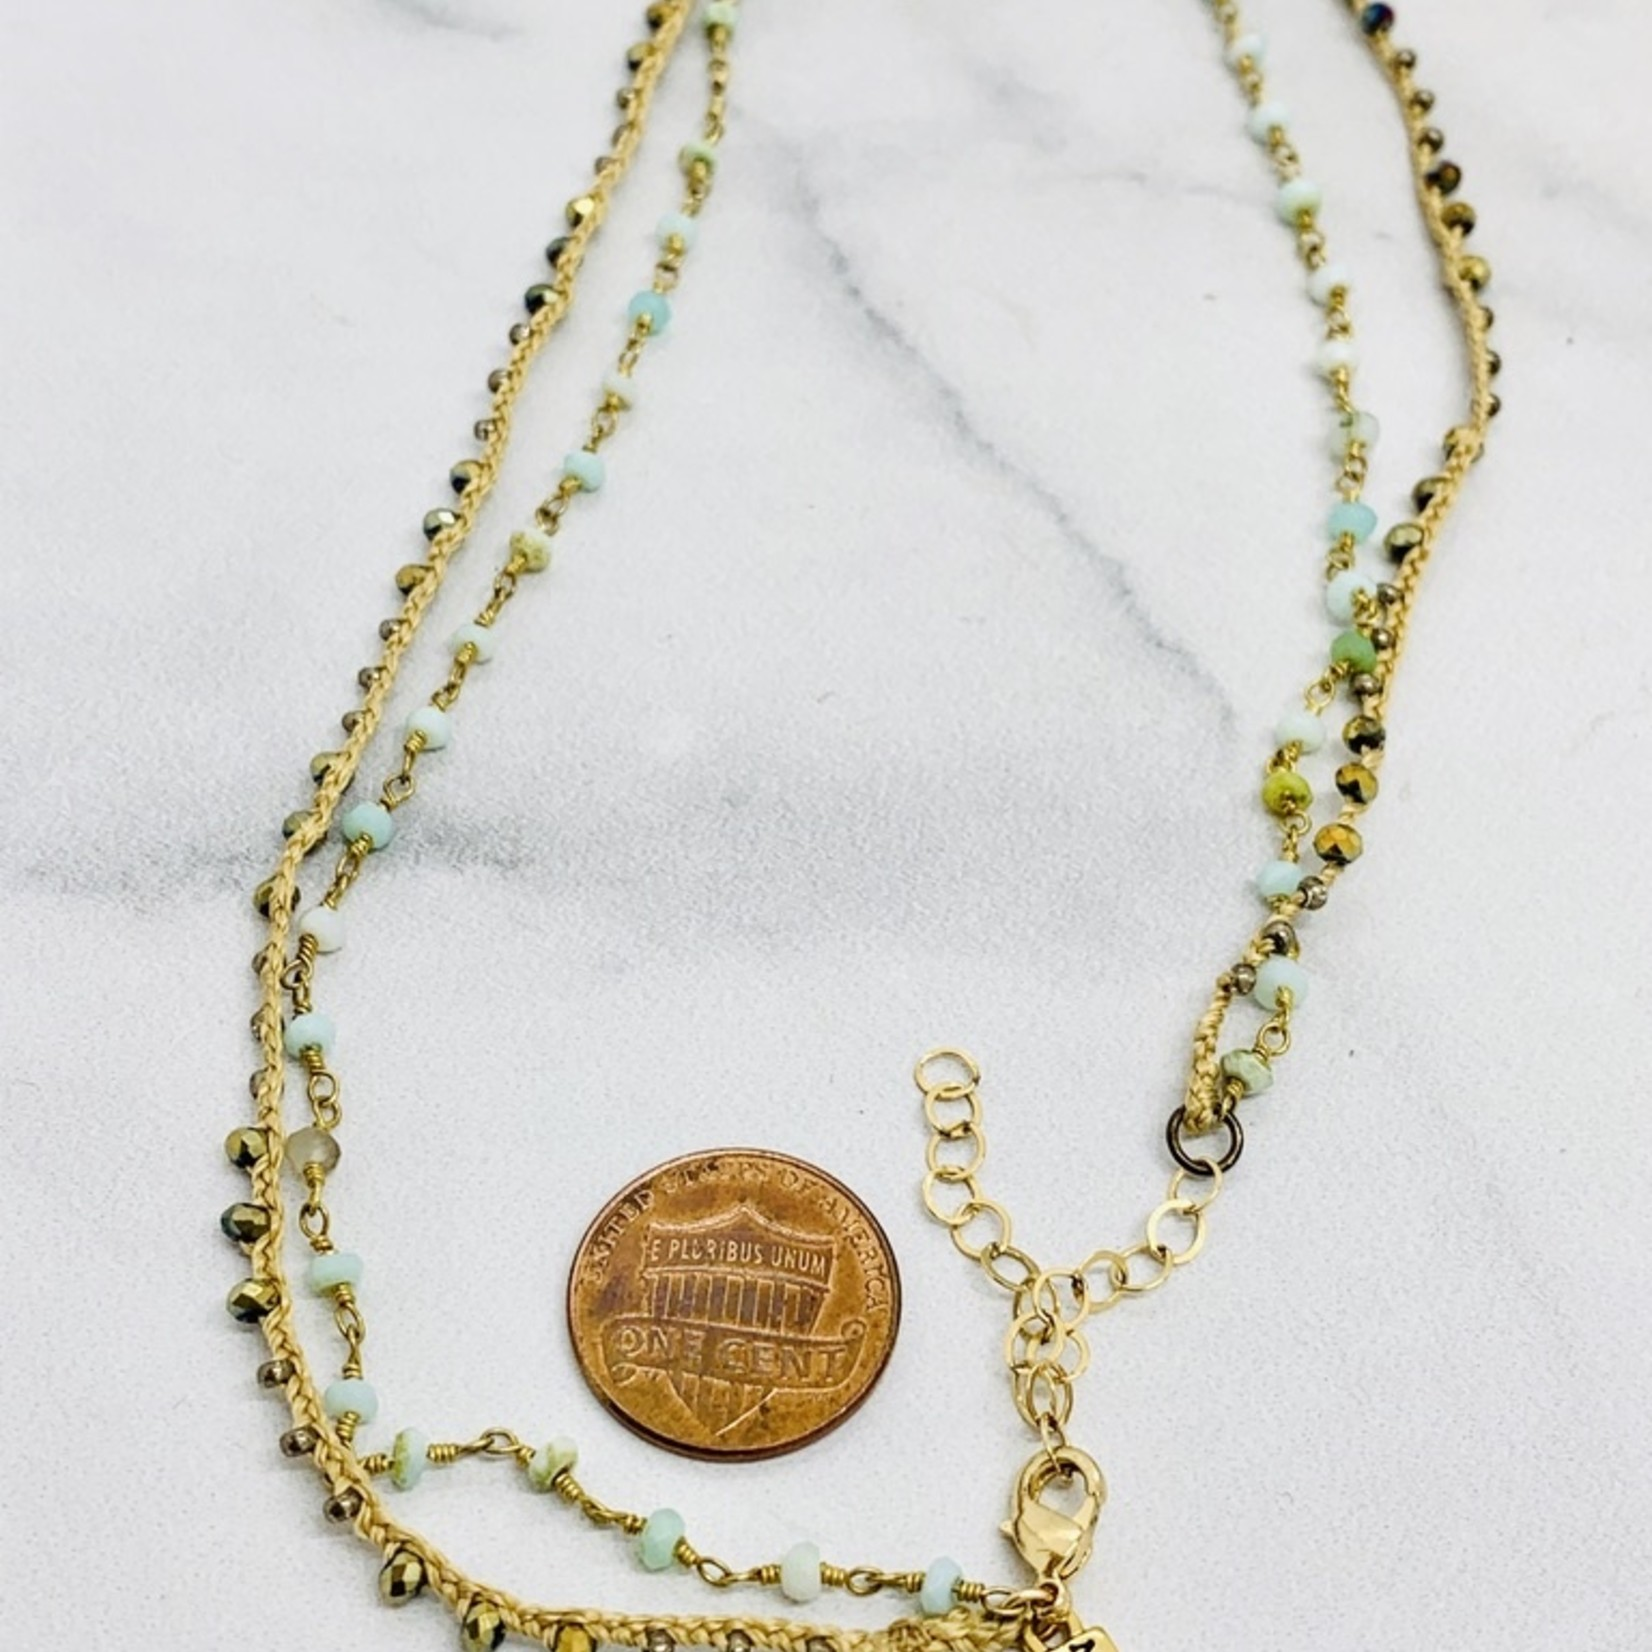 Native Gems RITUAL peruvian opal necklace | Double strands of 14k gold vermeil, silk, cz